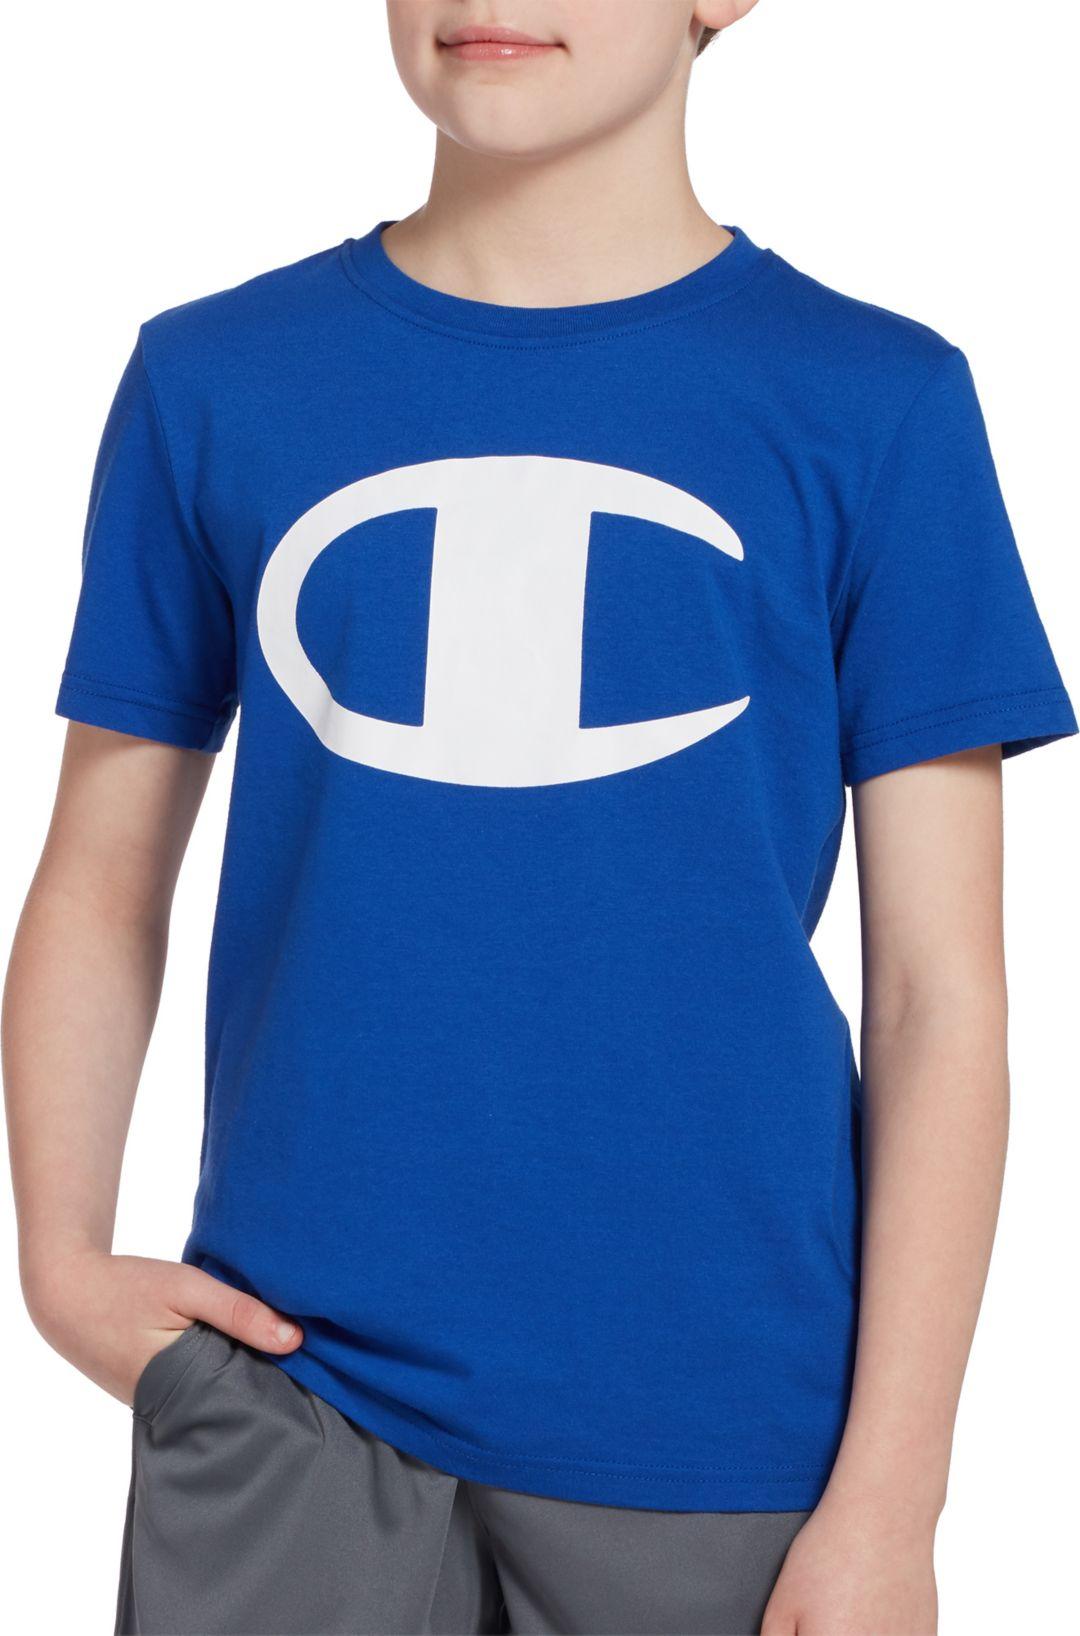 86cf82b6 Champion Boys' Heritage Graphic T-Shirt   DICK'S Sporting Goods